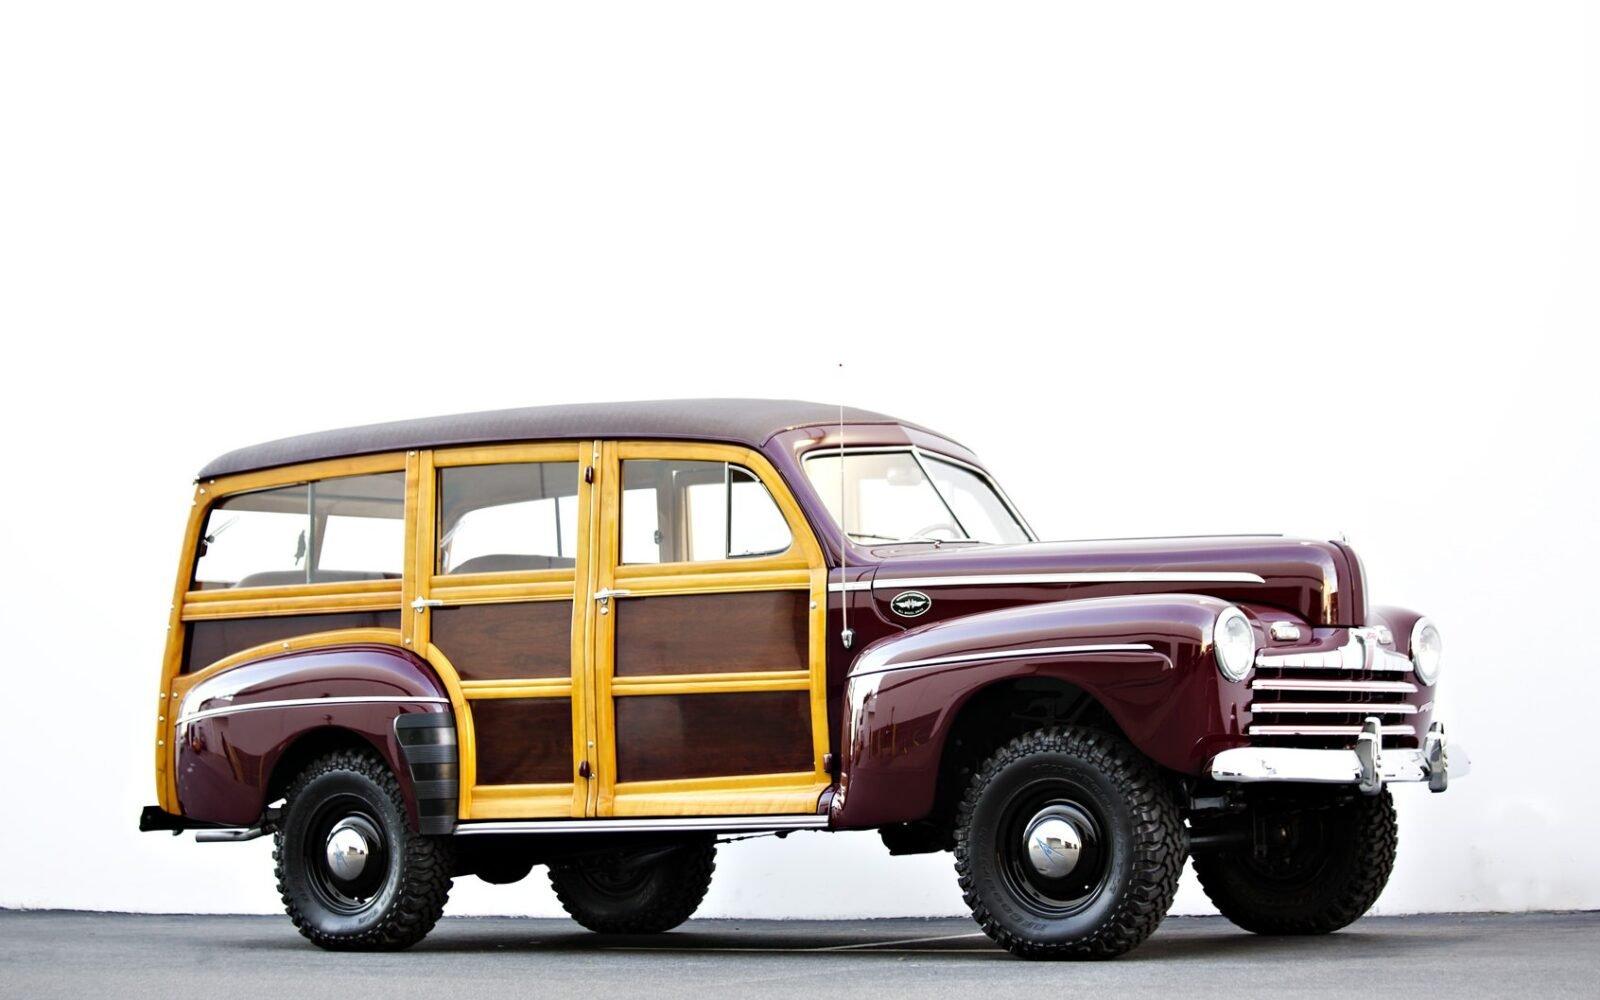 Ford Marmon Herrington Woodie 4x4 e1419672895860 1600x1000 - Ford Marmon-Herrington Woodie 4x4